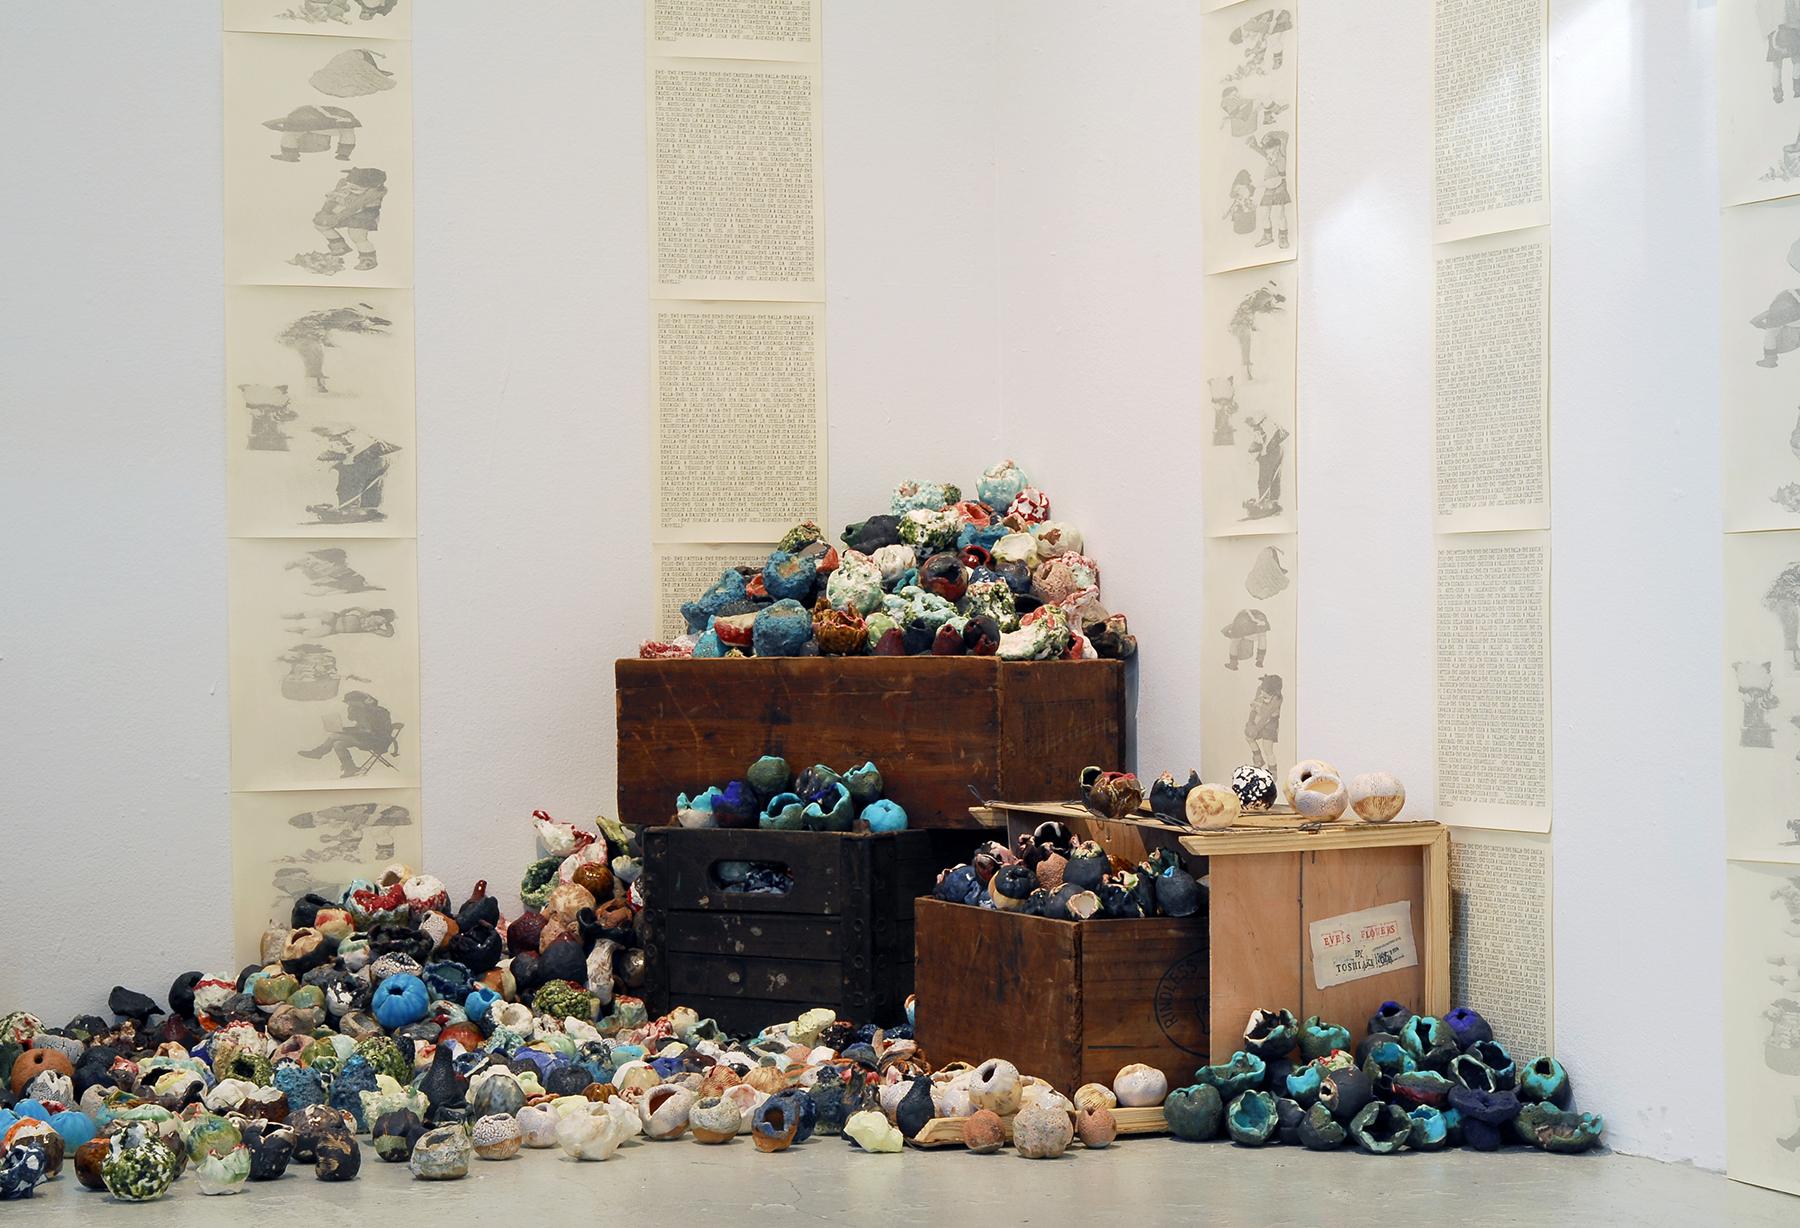 "2014 Gallery View,Toshiaki Noda's installation of ceramics""Eve's Flowers"".Photos by Samantha Wrigglesworth"